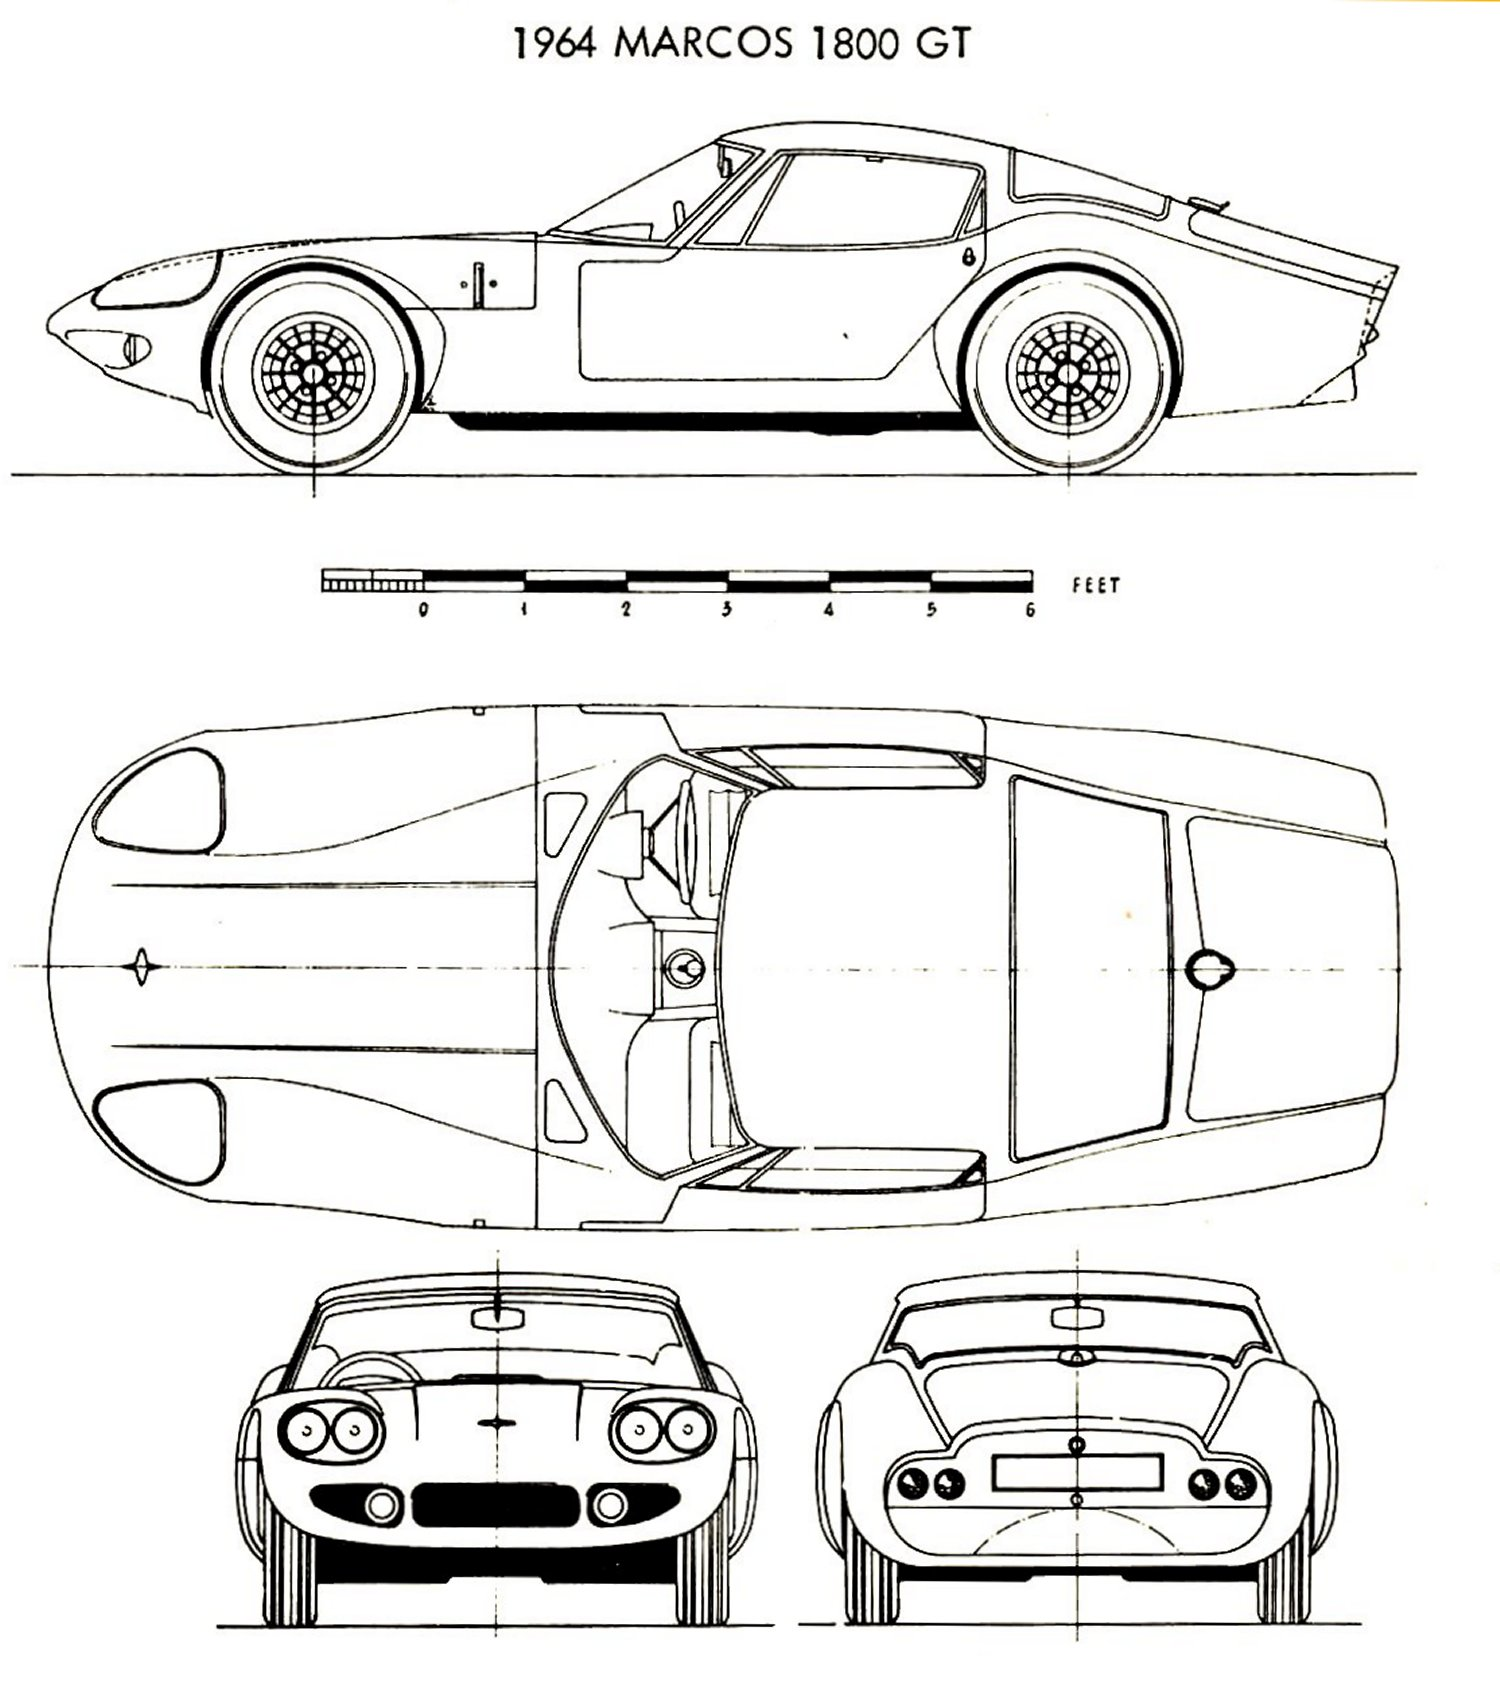 Marcos 1800 blueprint